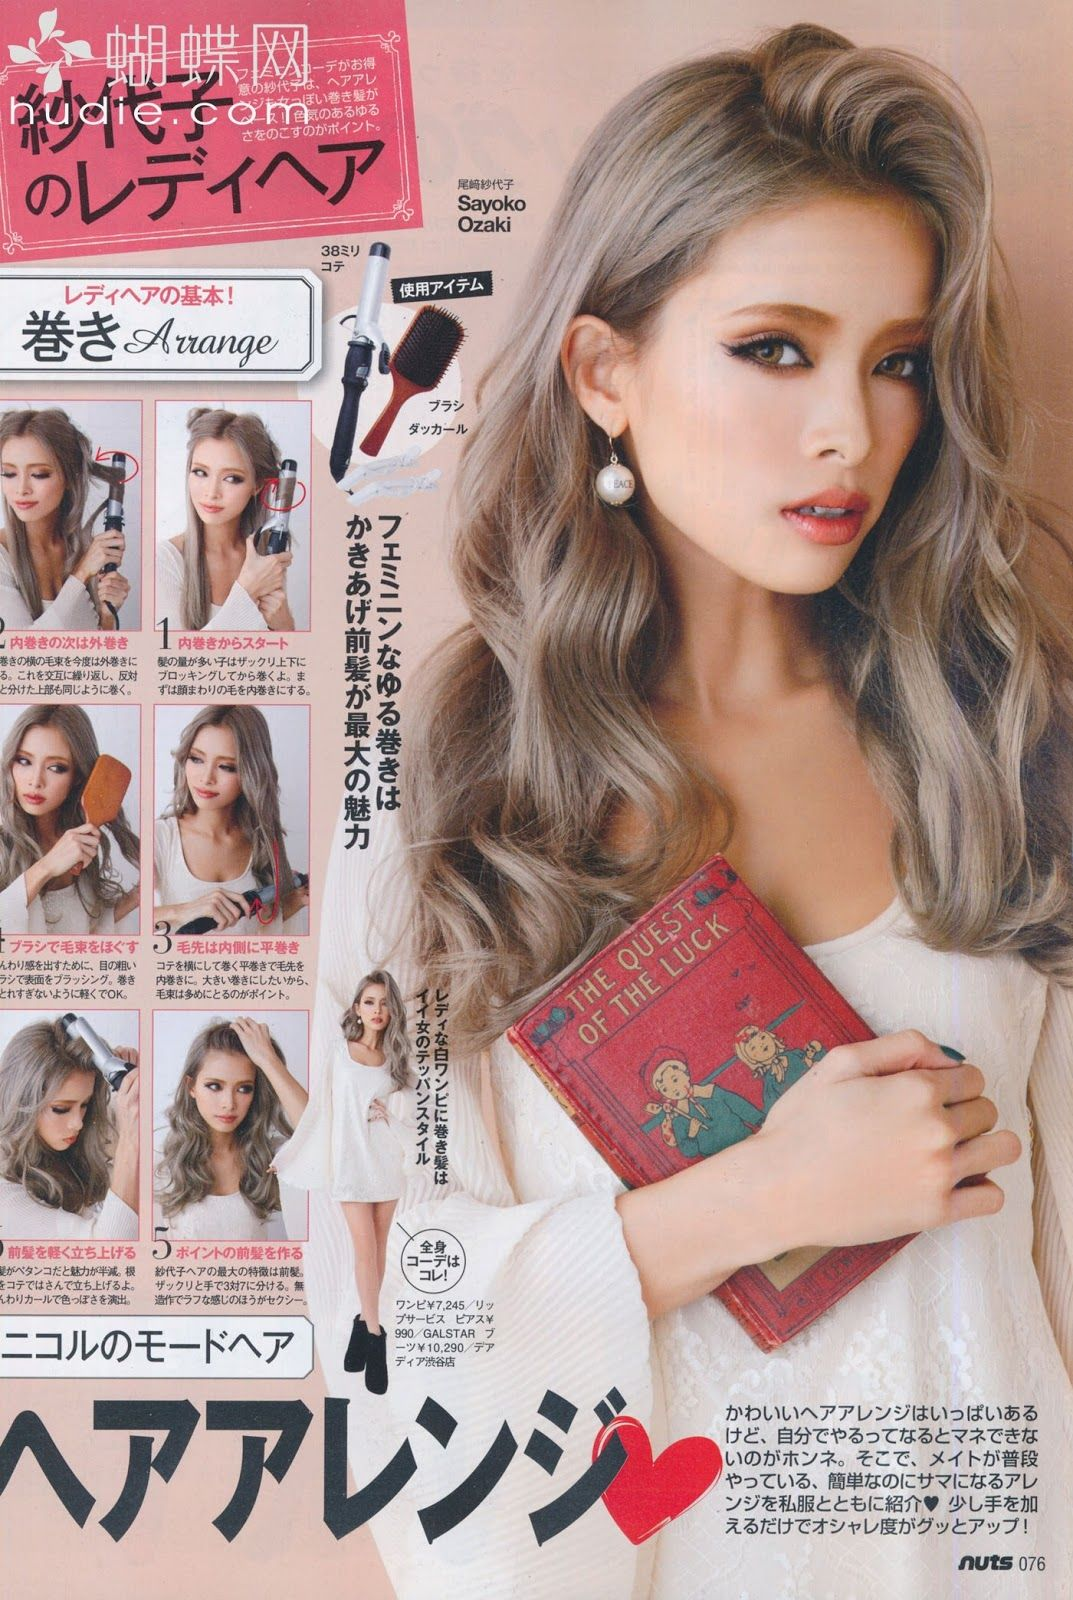 Sayoko Ozaki Hair Tutorial I Just Love The Waves And Ashy Haircolor